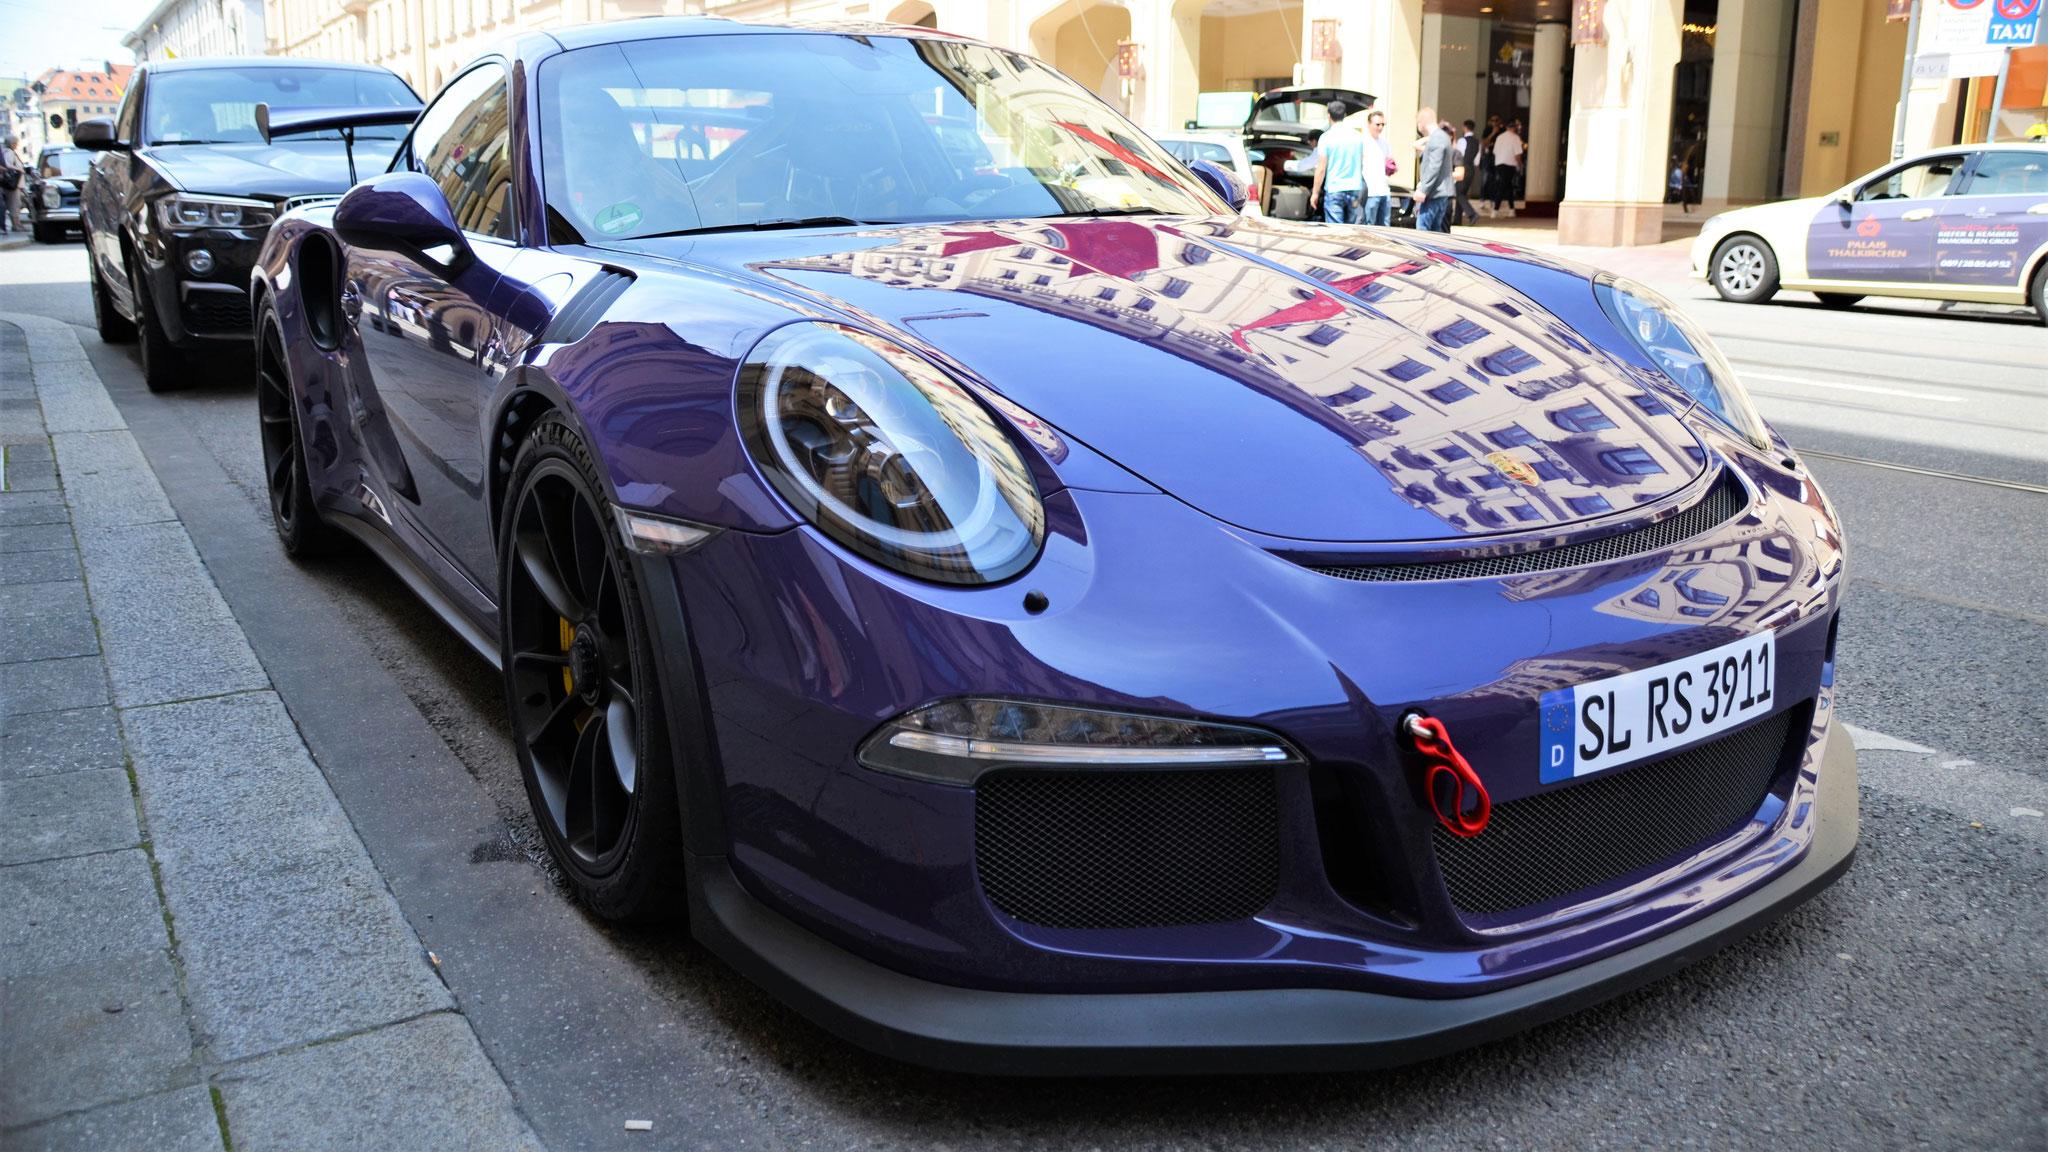 Porsche 911 GT3 RS - SL-RS-3911